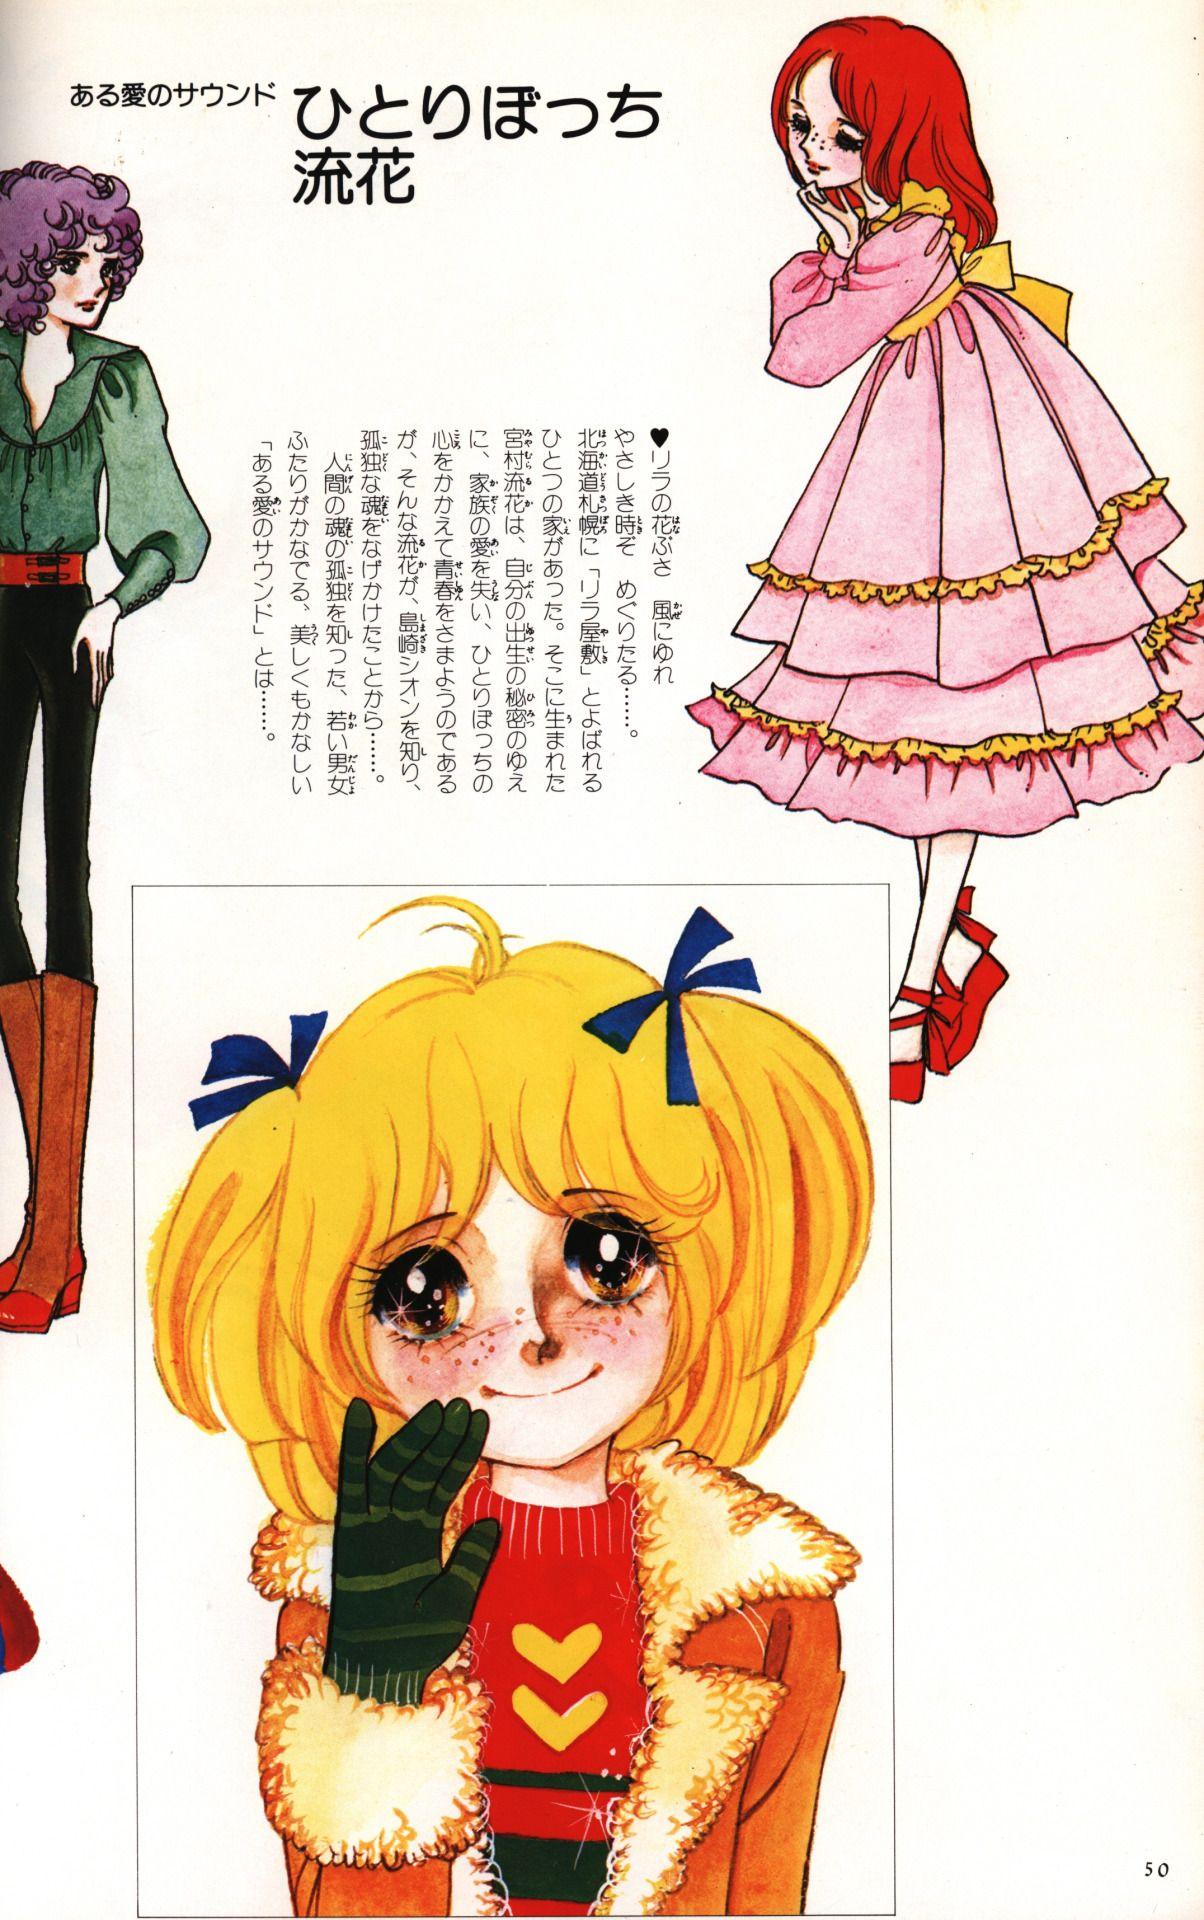 Pin on Anime & Manga